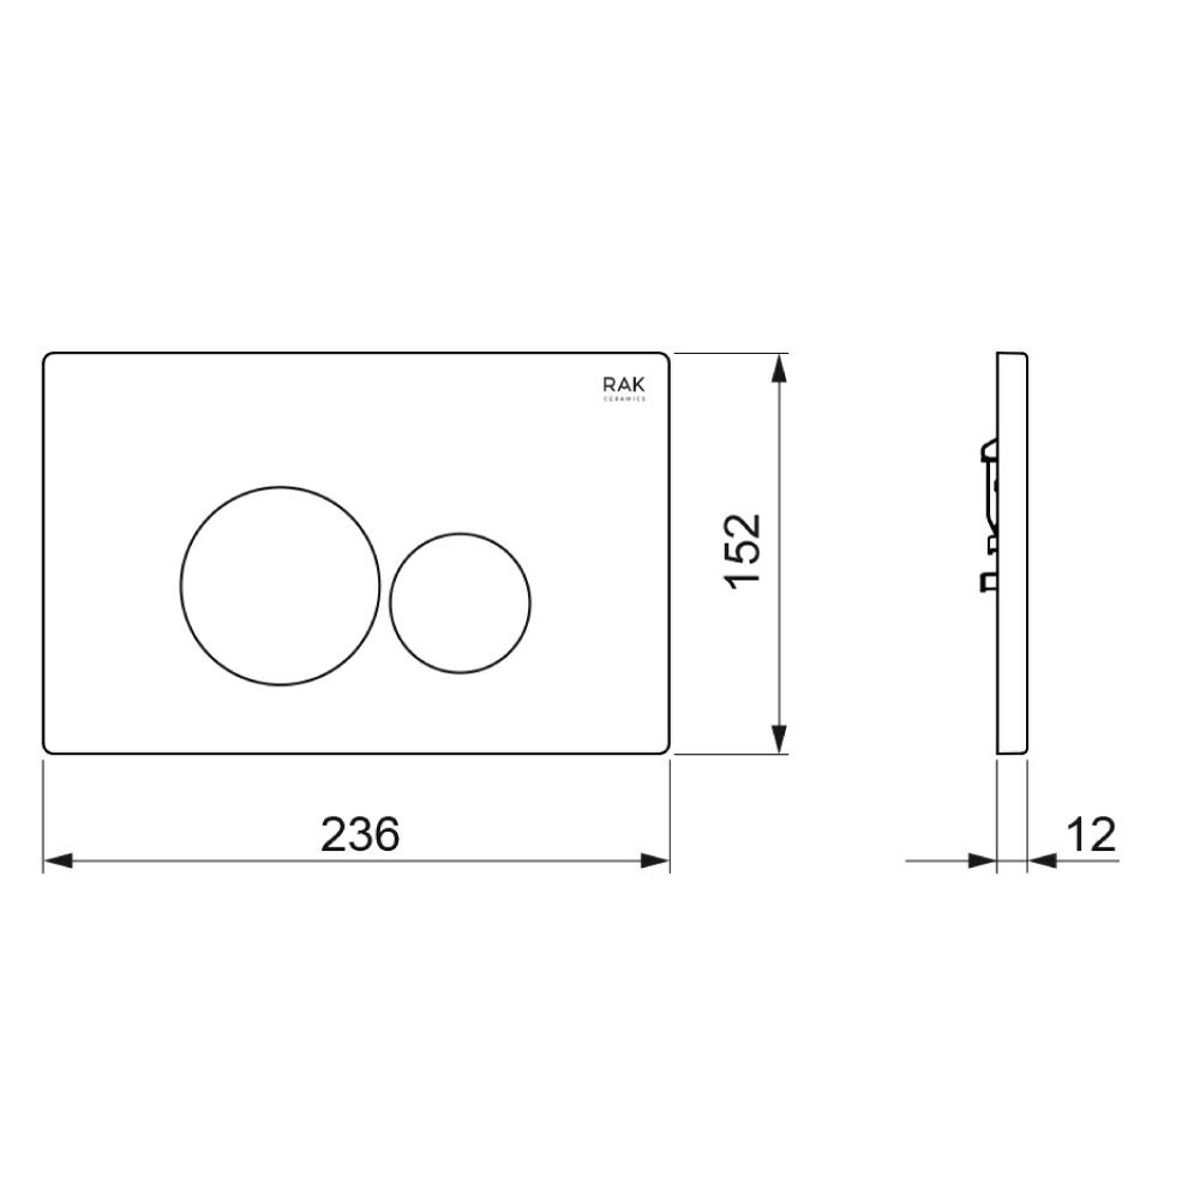 RAK Ecofix White Flush Plate with Round Push Buttons Measurements